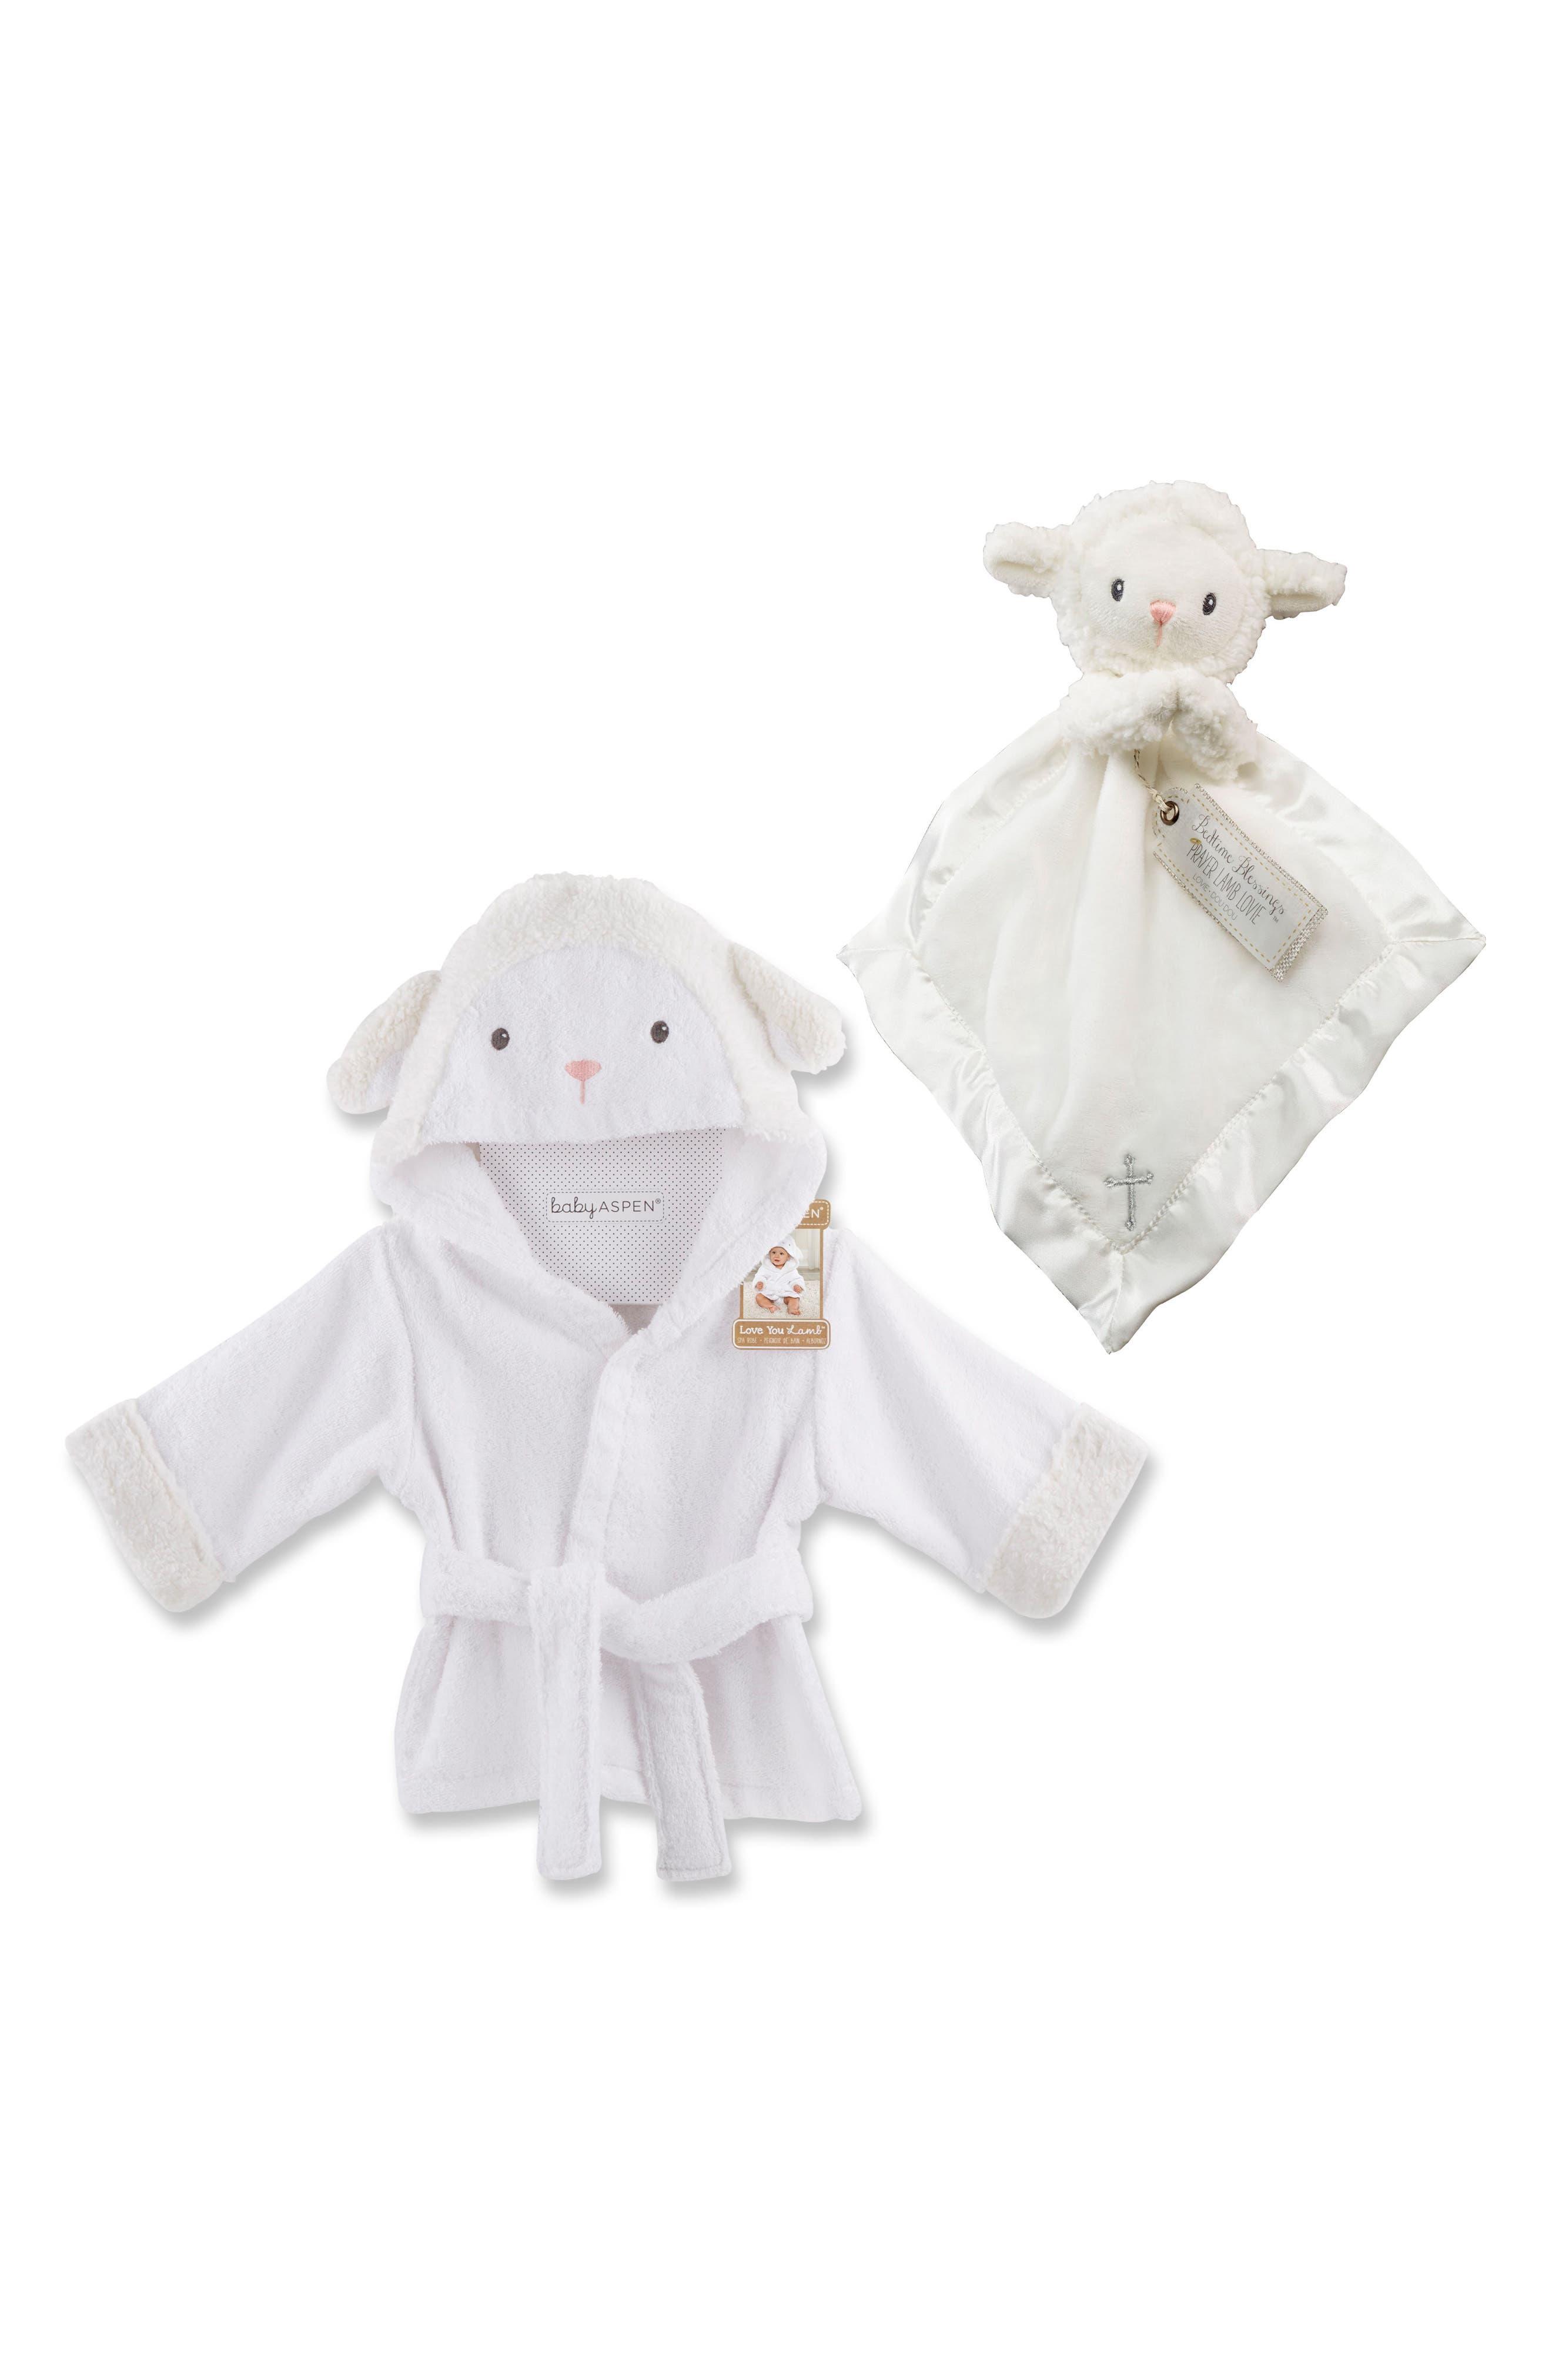 Lamb Hooded Robe & Blanket,                         Main,                         color, WHITE